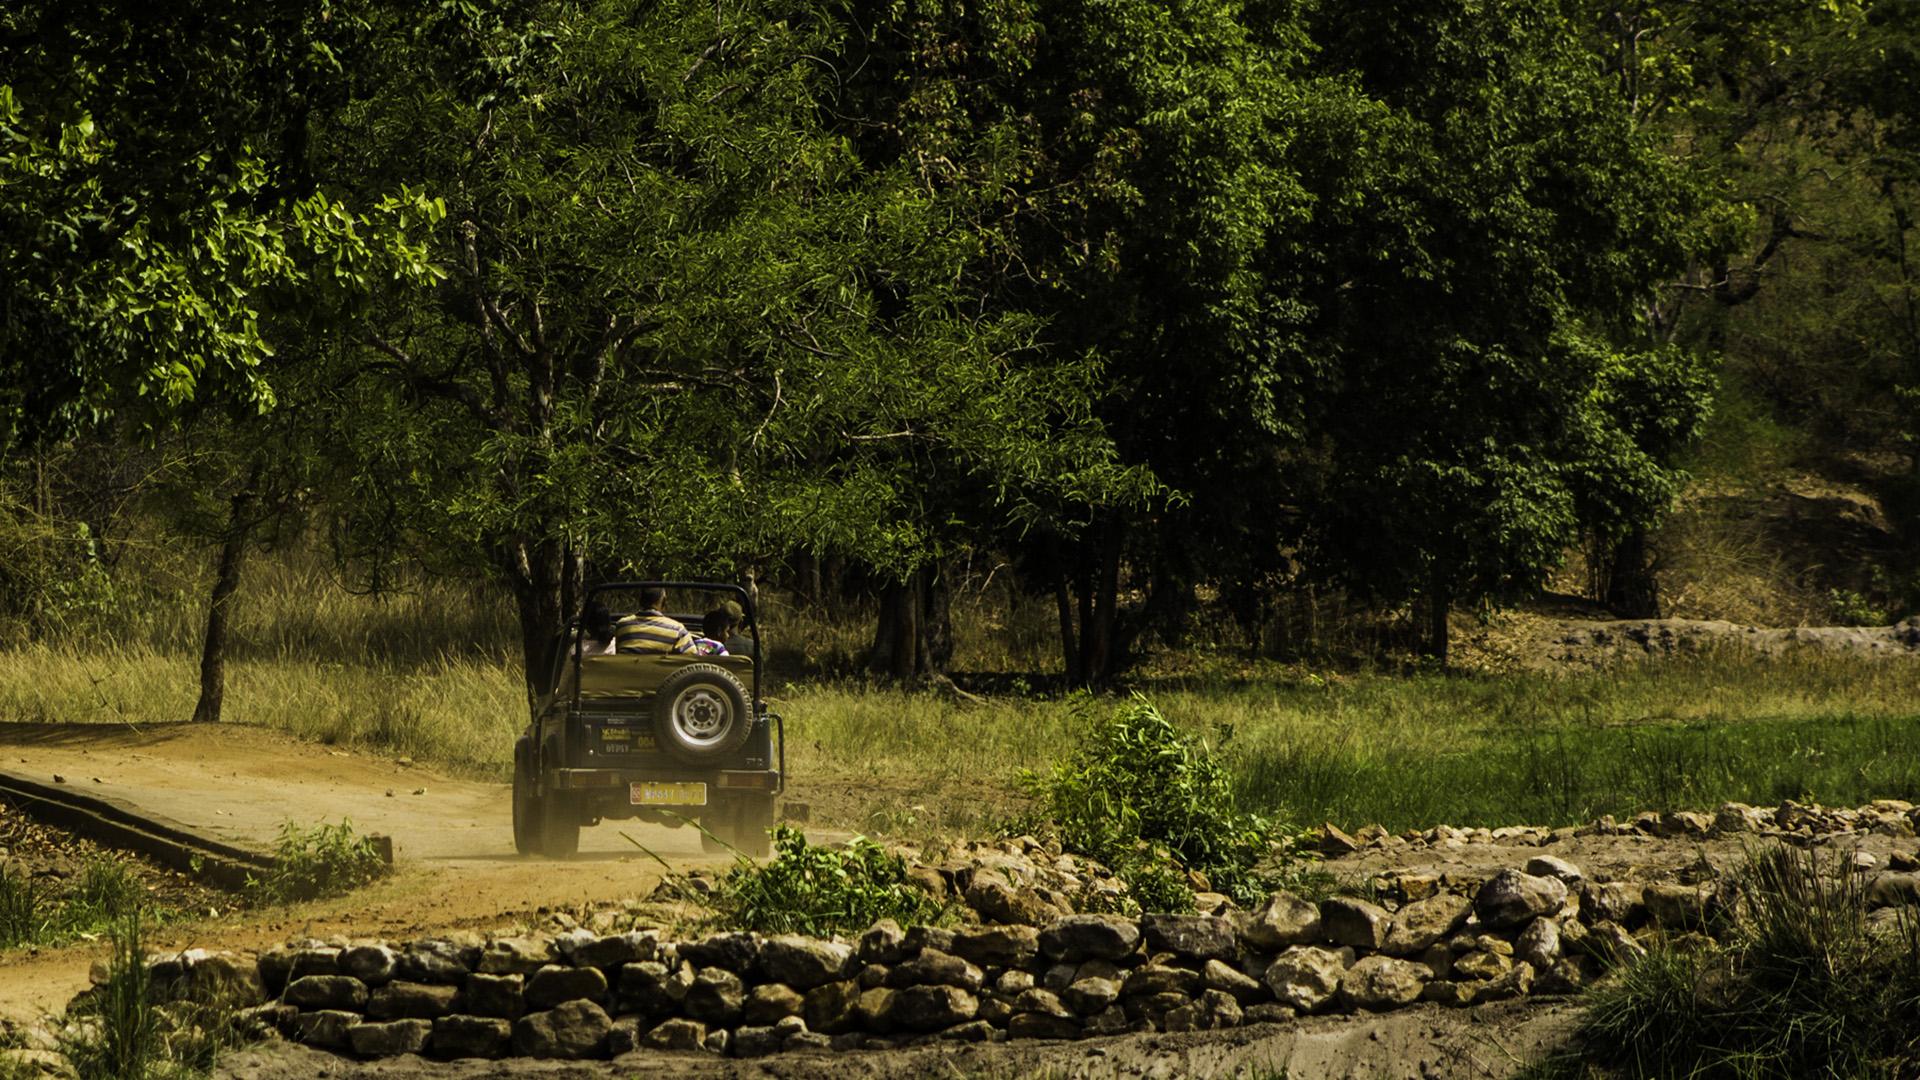 The Wild Side of Bandhavgarh